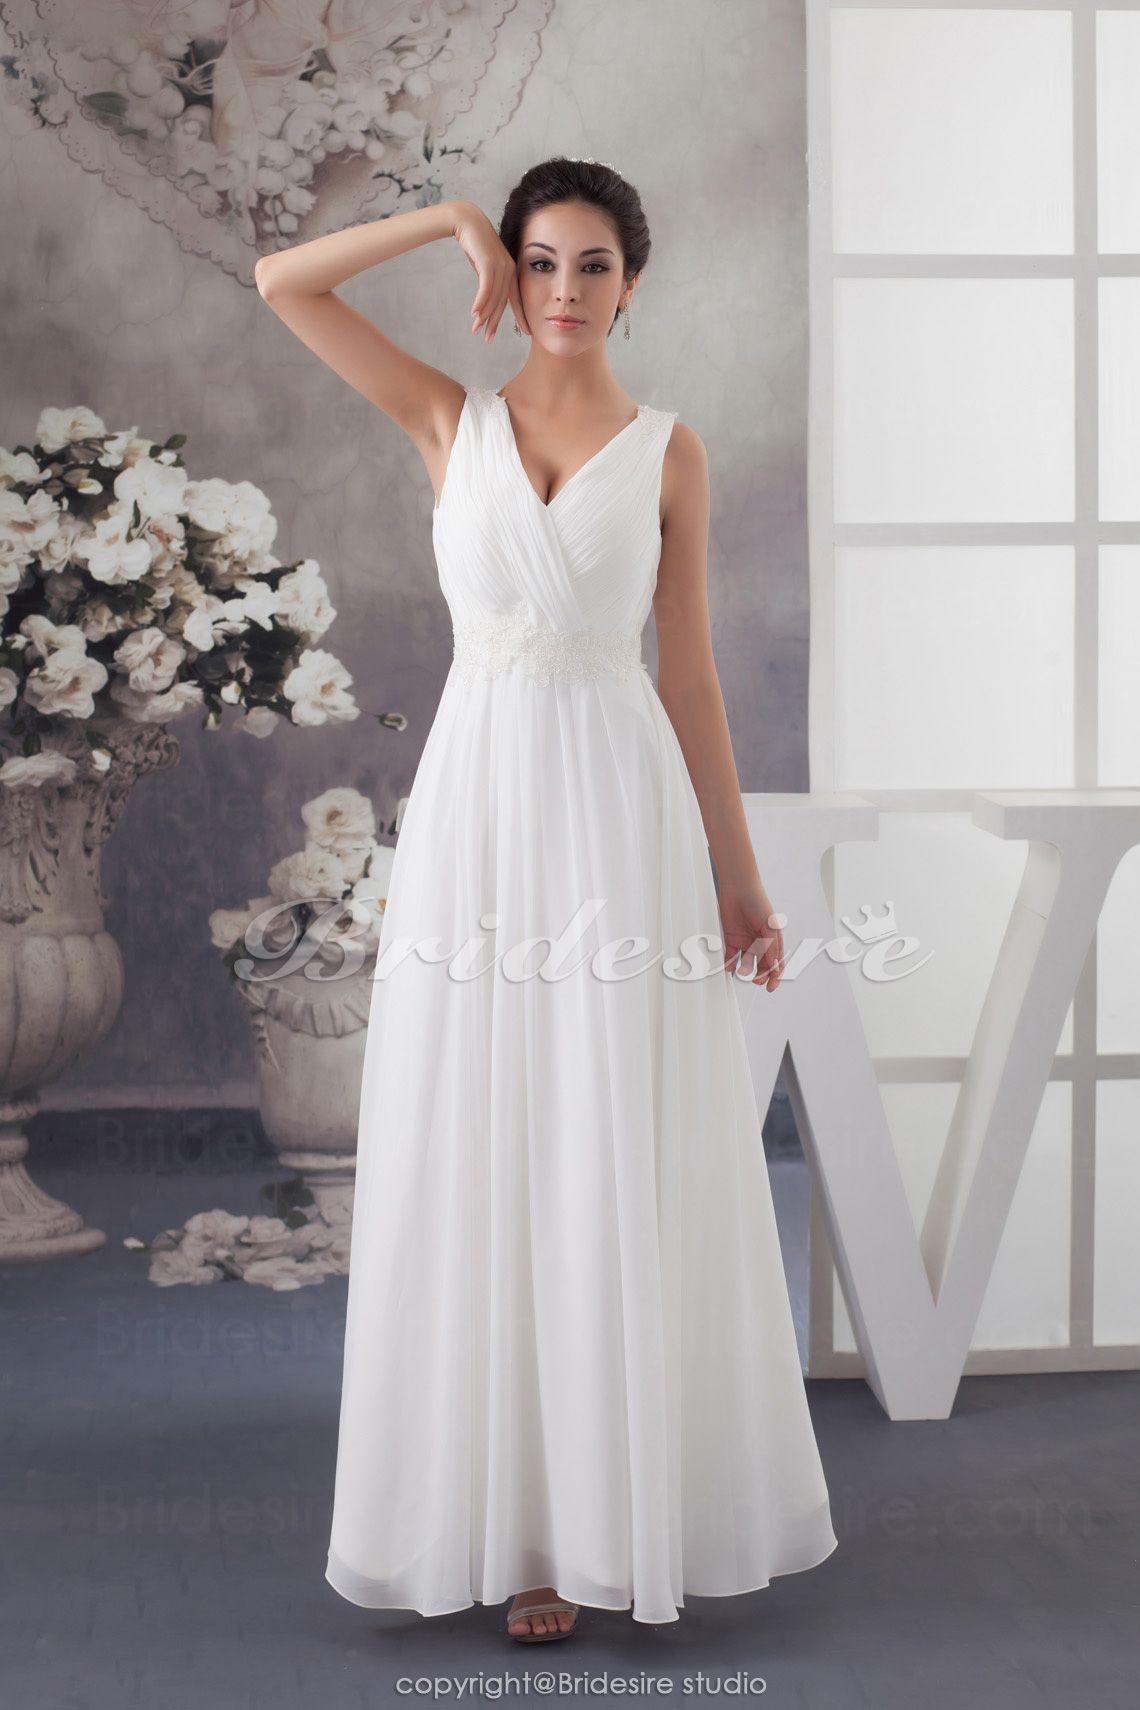 The Green Guide Sheath Column V Neck Floor Length Sleeveless Chiffon Wedding Dress Bd4792 Us 92 99